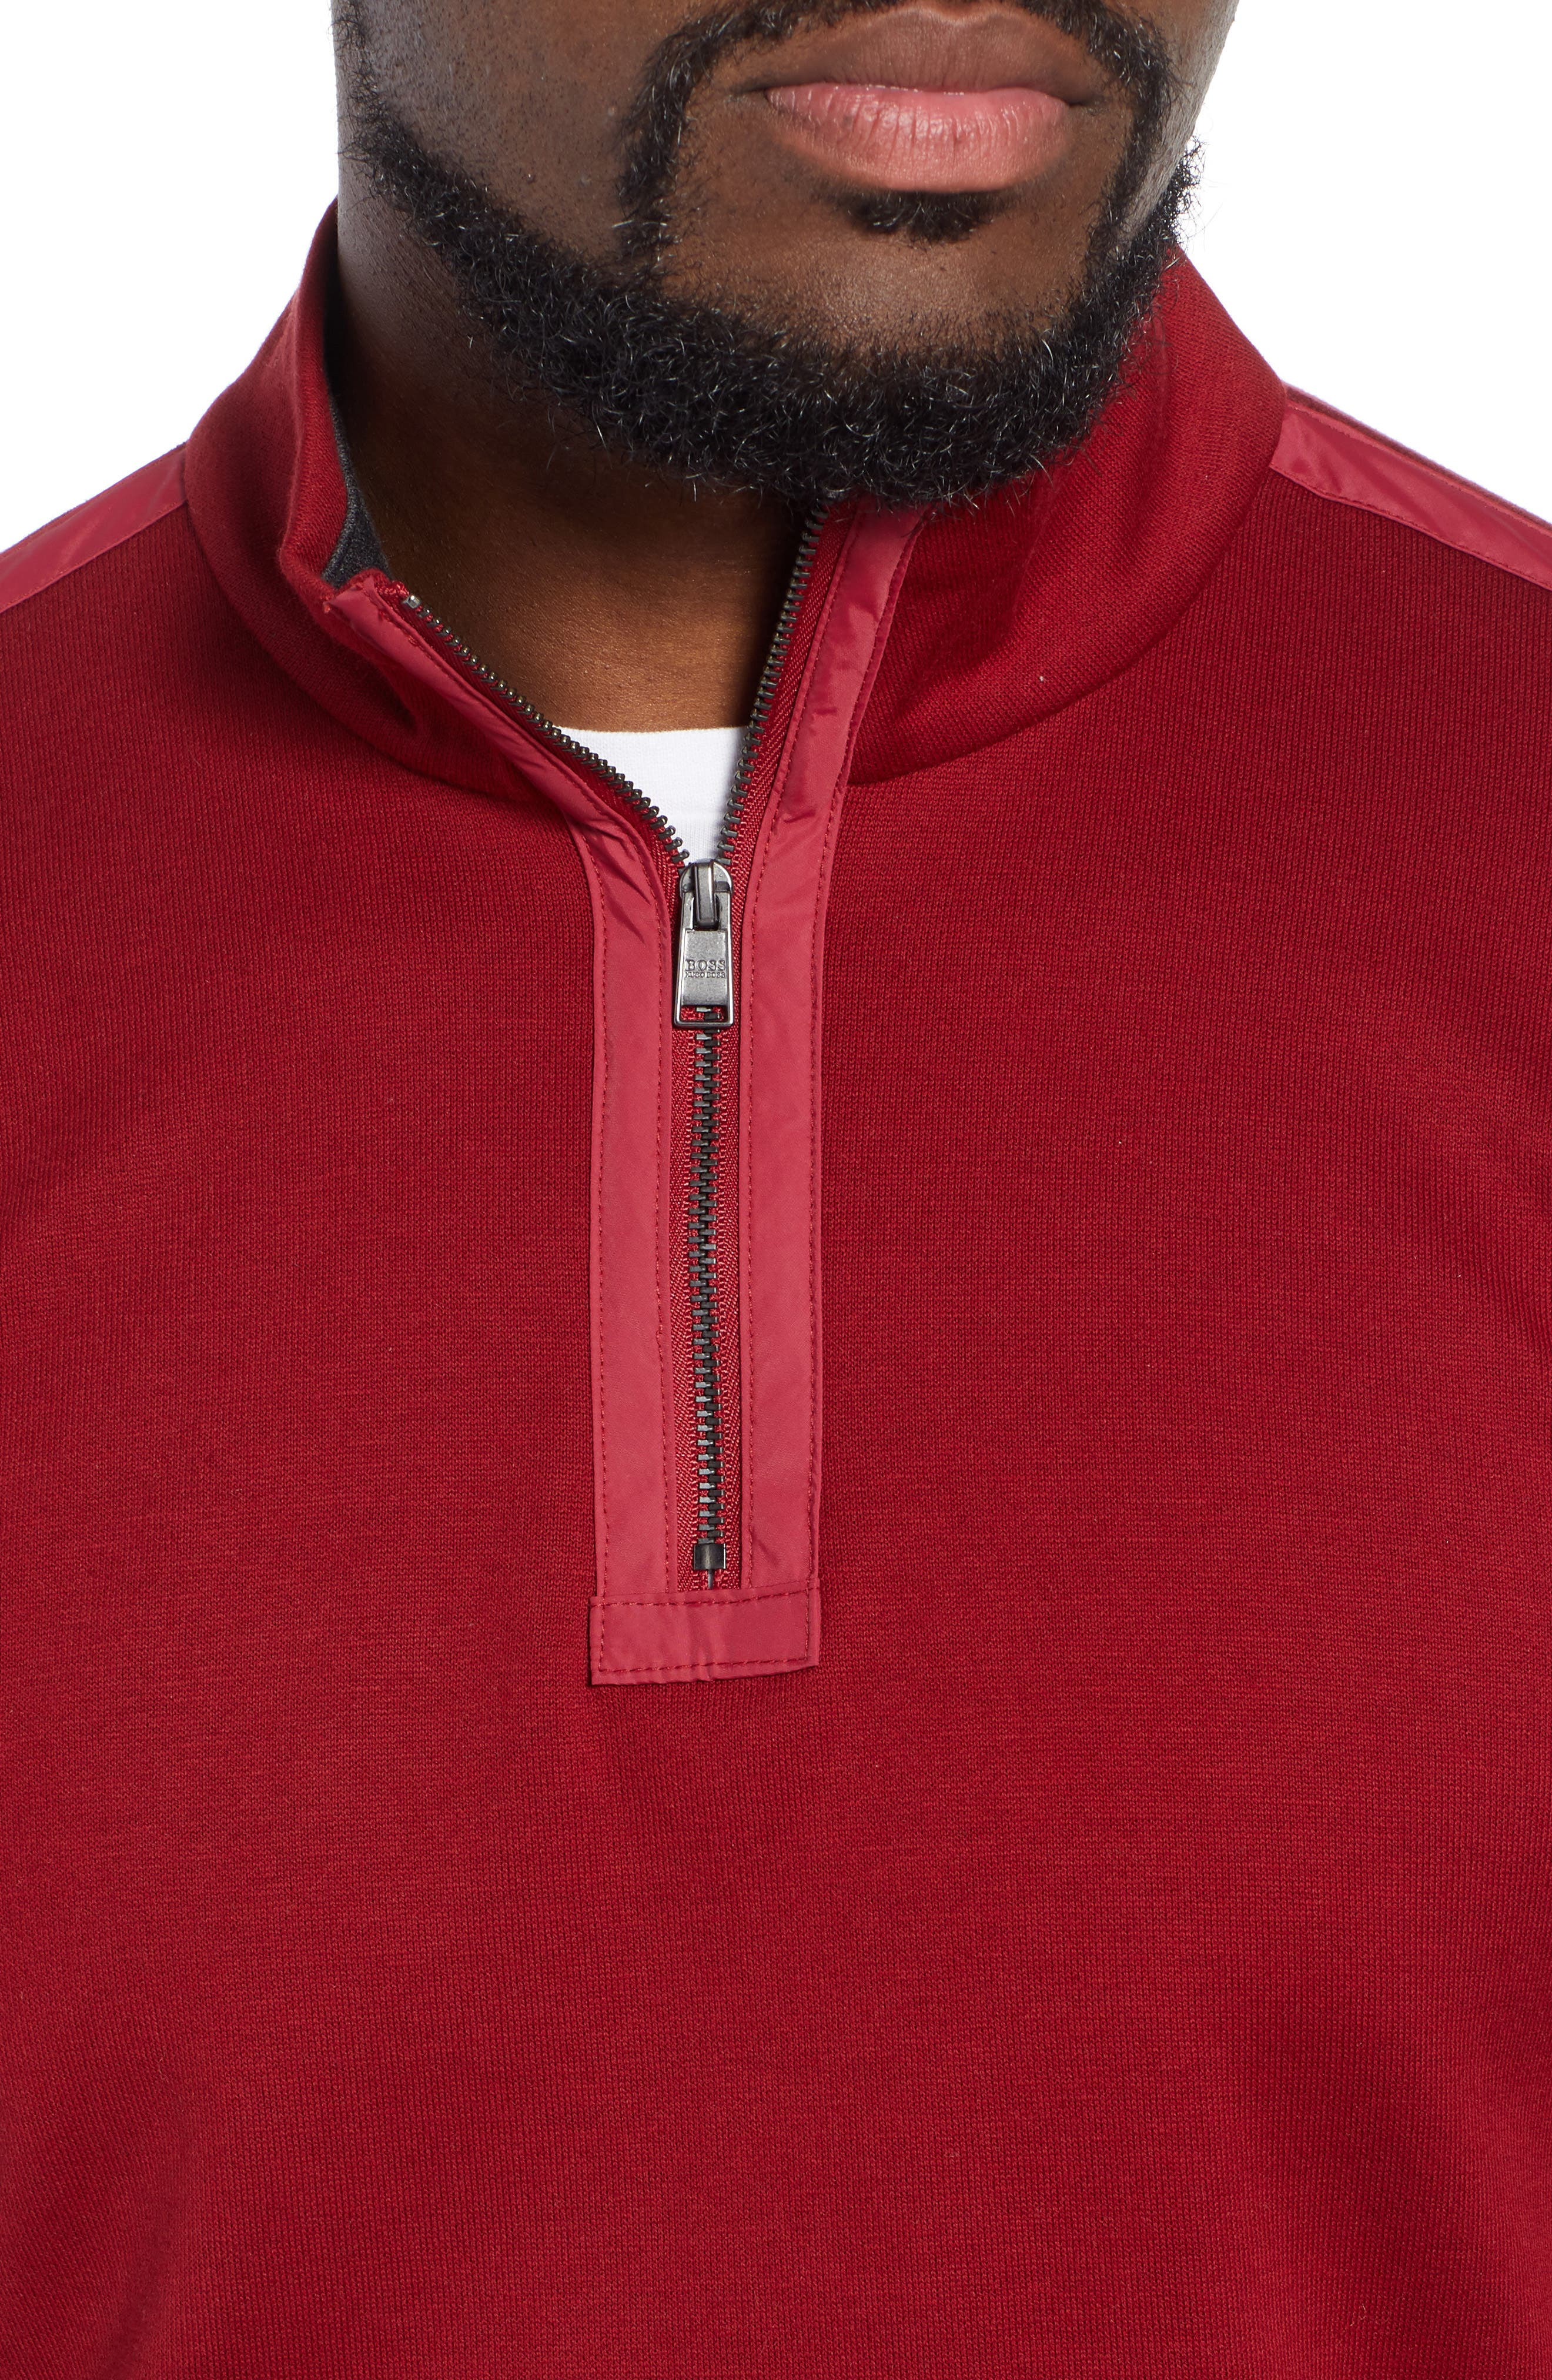 Sidney Quarter Zip Pullover,                             Alternate thumbnail 4, color,                             RED